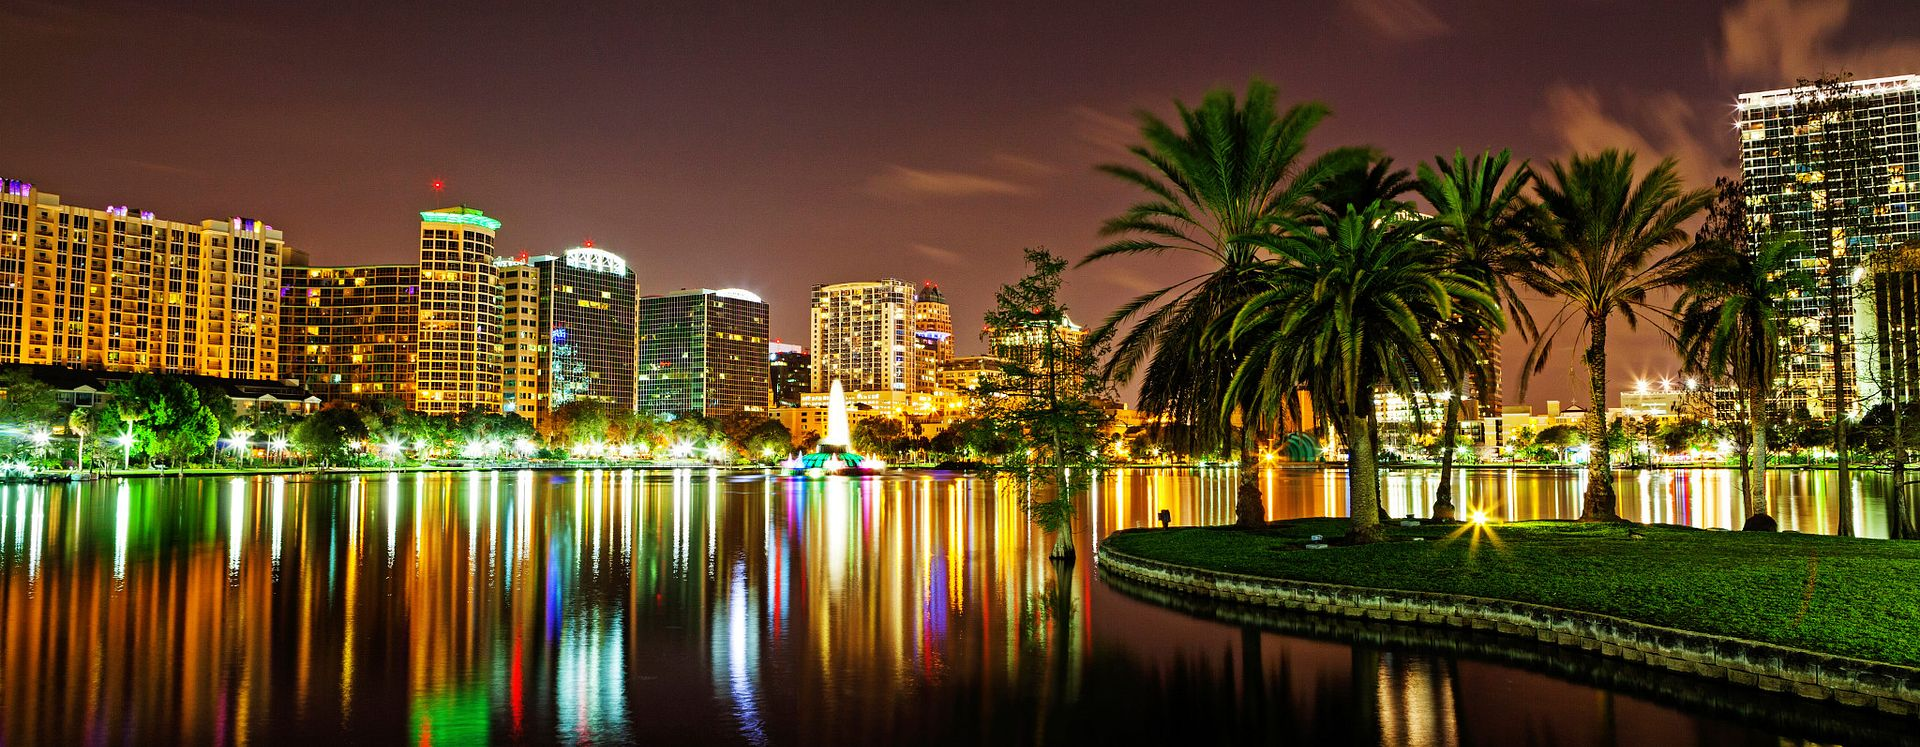 downtown, orlando, lake eola, skyline